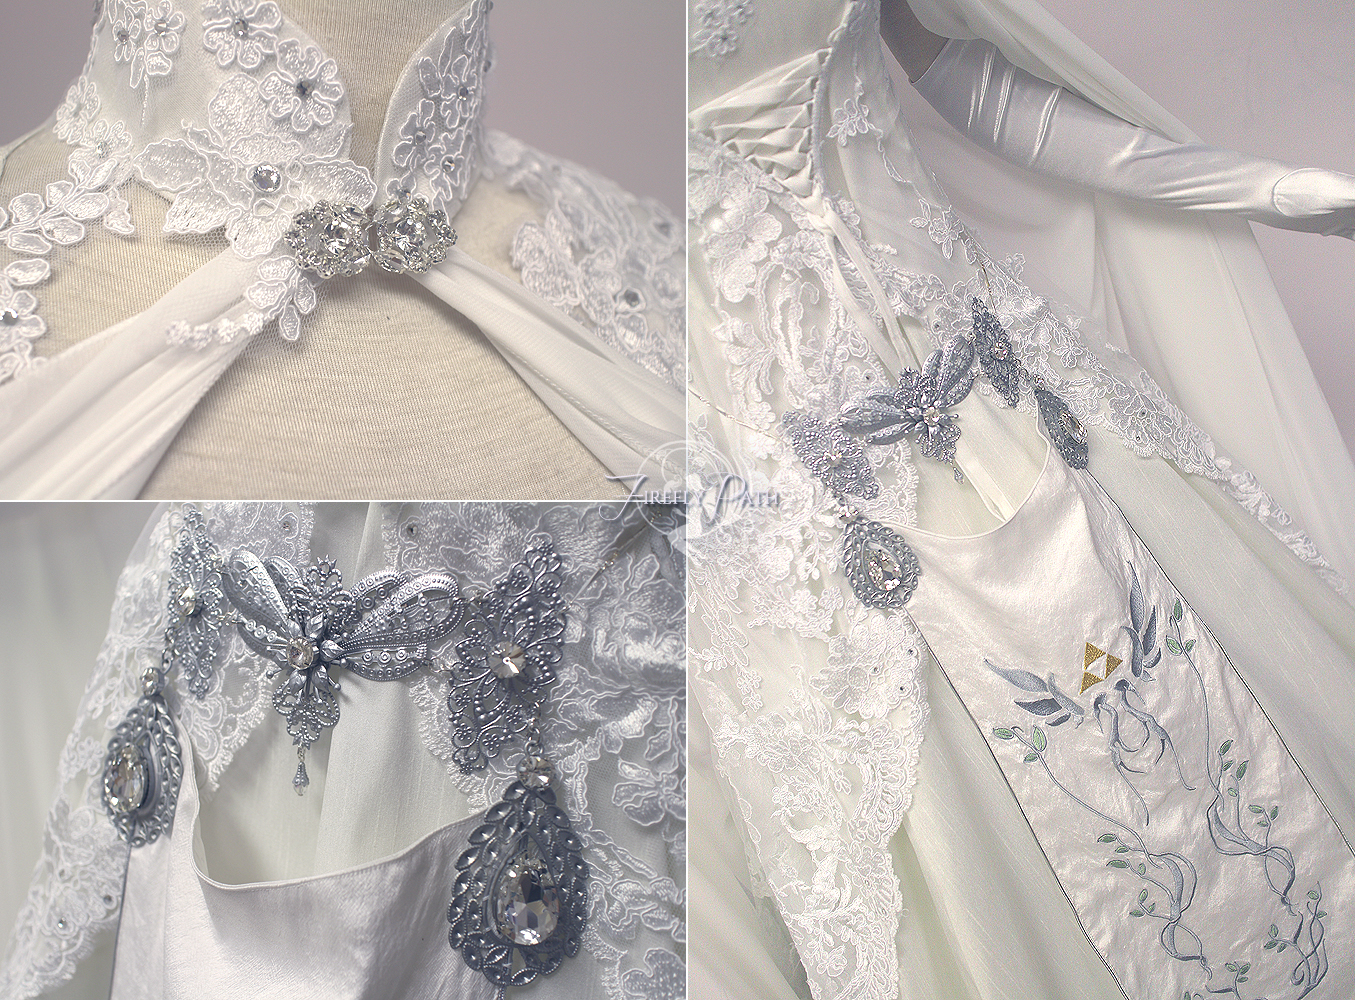 Zelda wedding dress details by firefly path on deviantart for Legend of zelda wedding dress